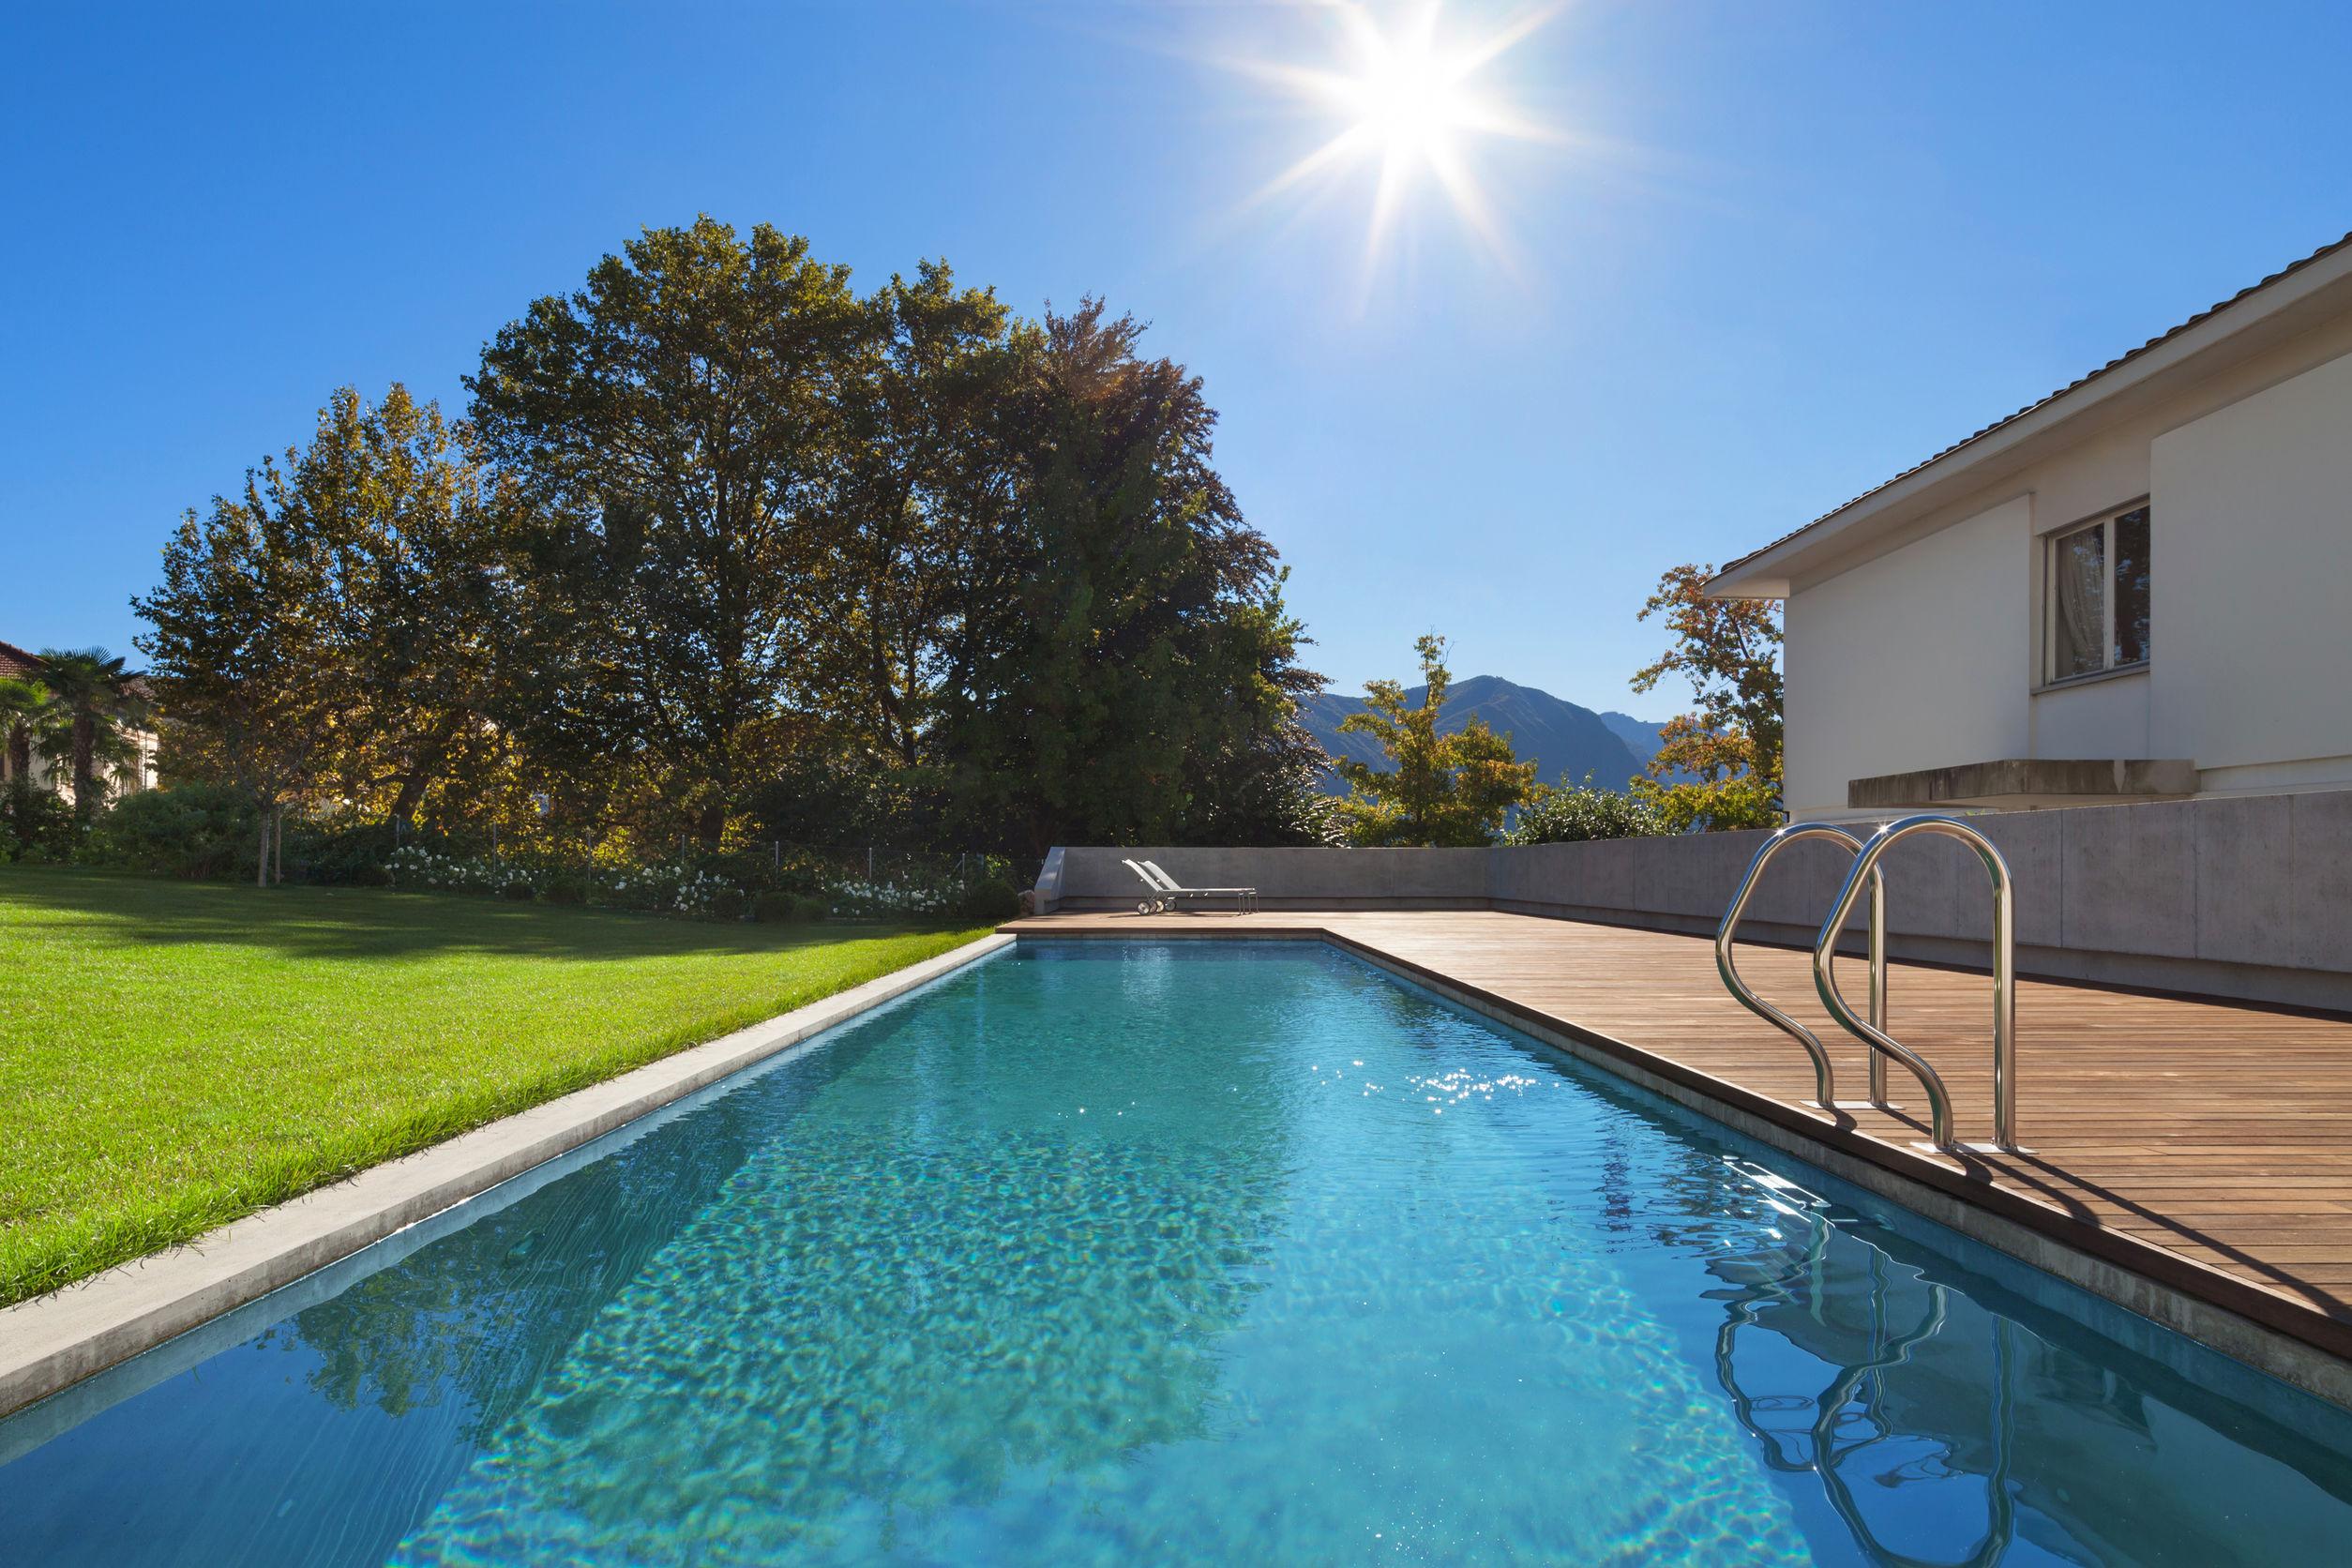 Revaloriza tu casa construyendo una piscina